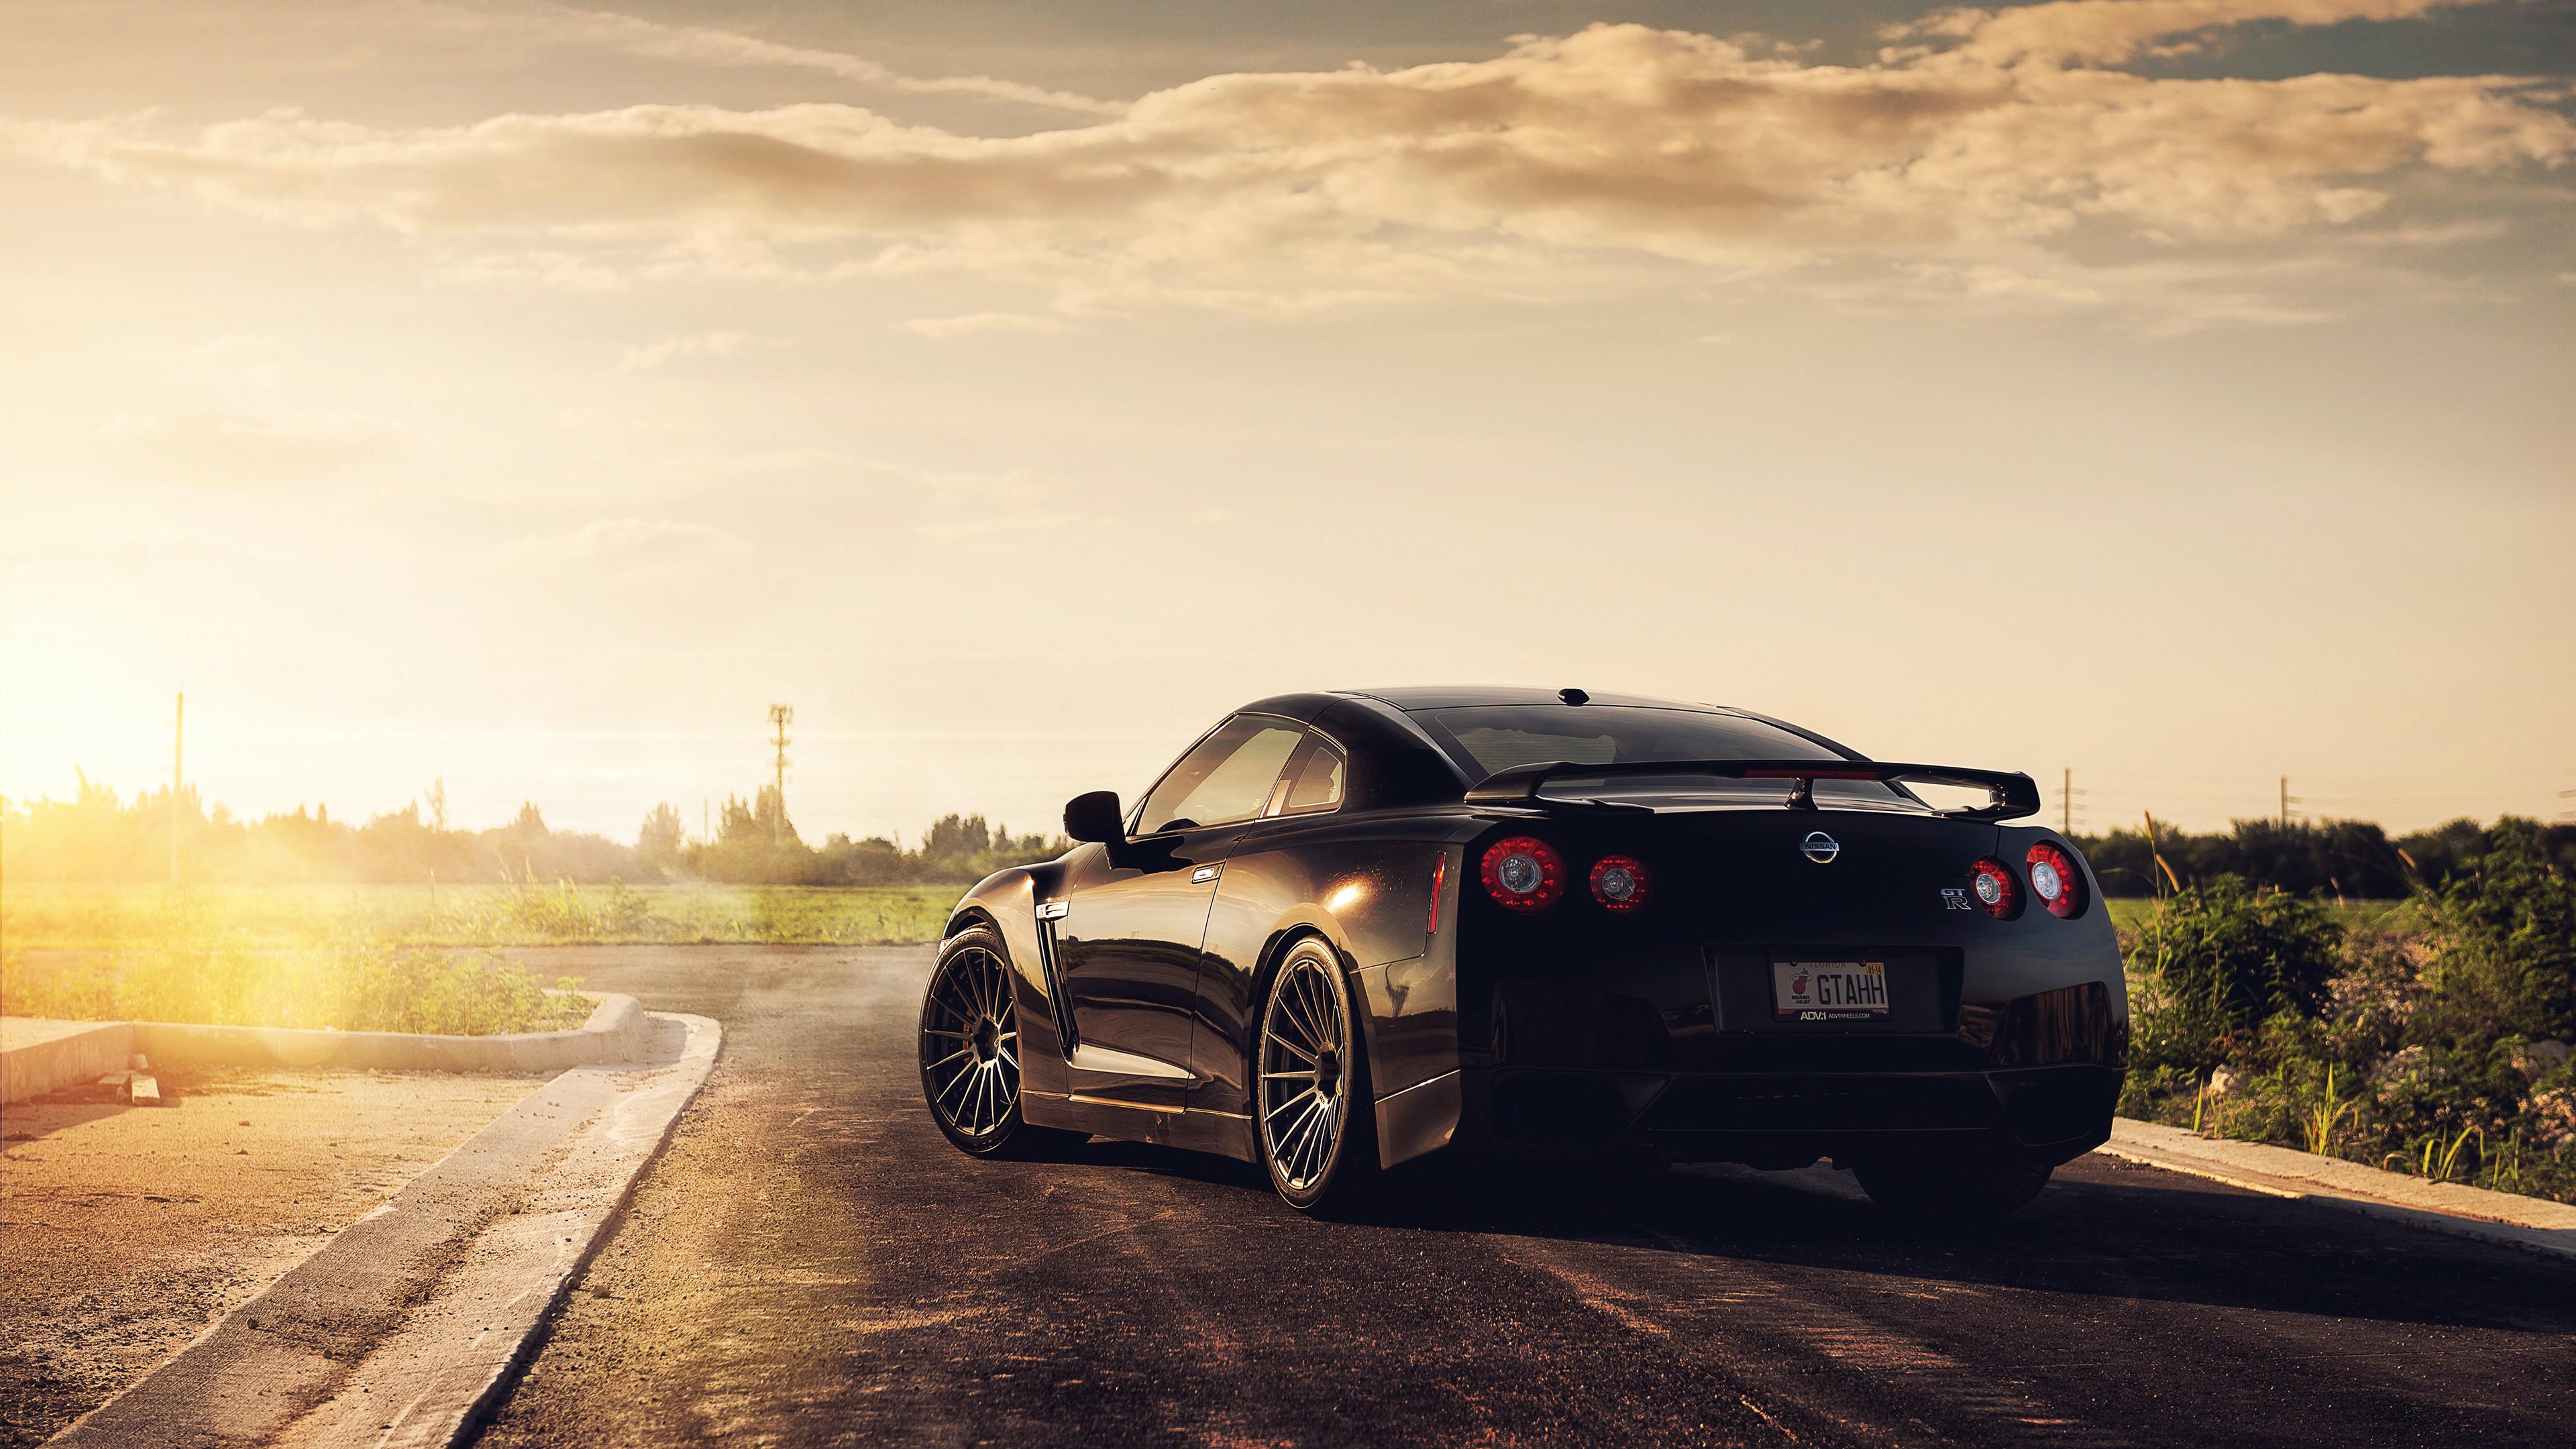 4K_Ultra_HD_cars_wallpapers_4